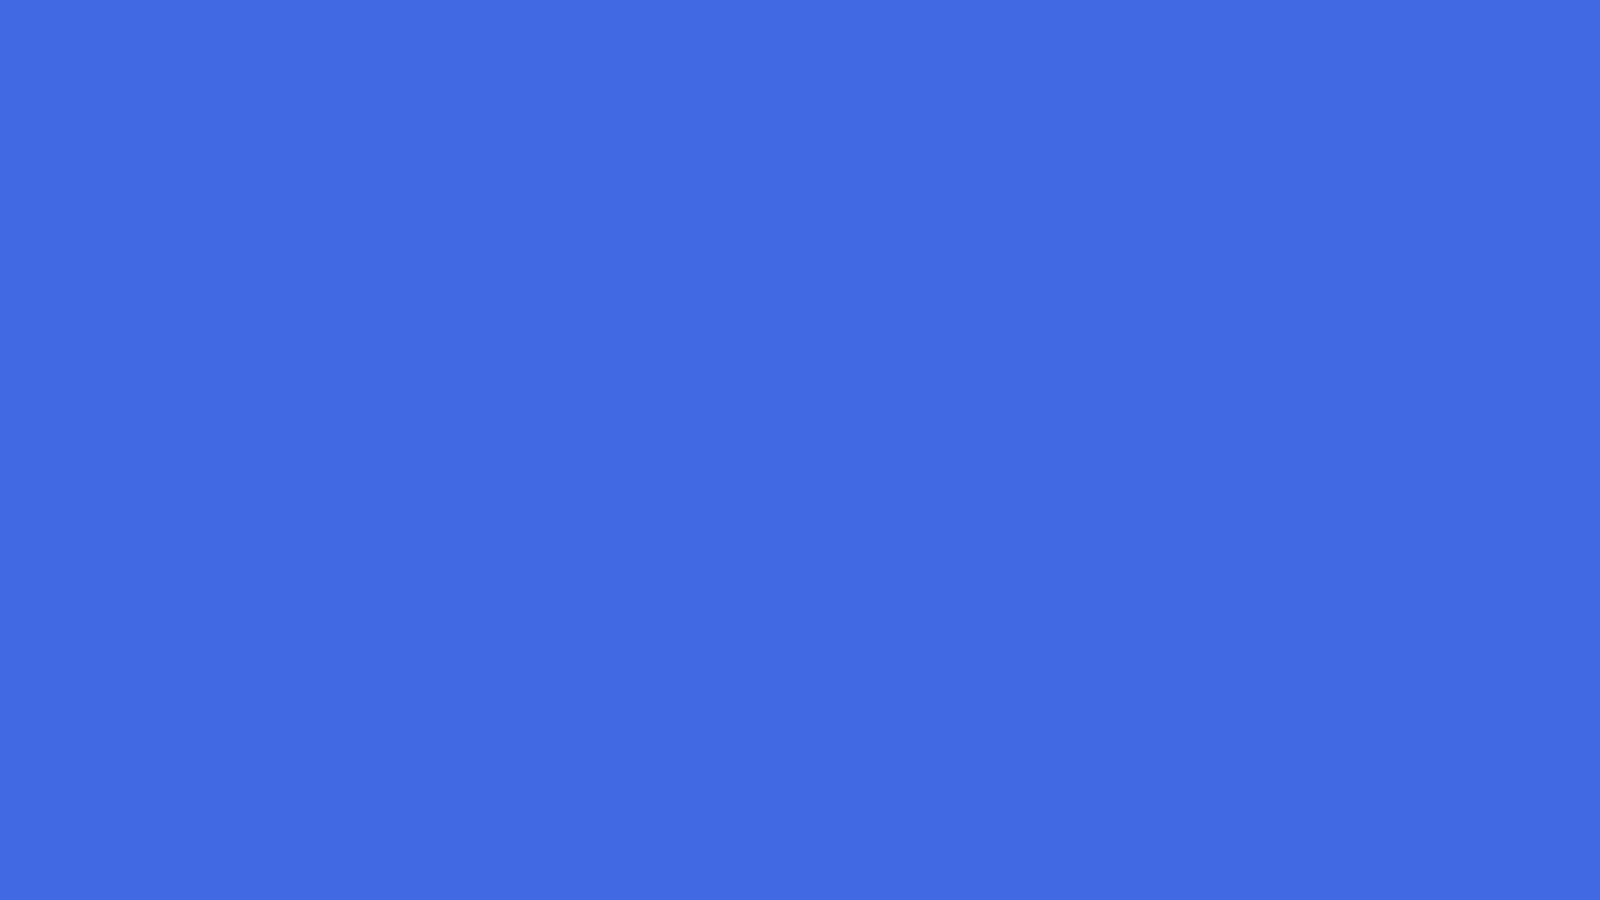 Plain Blue Background Hd Wallpapers Plain